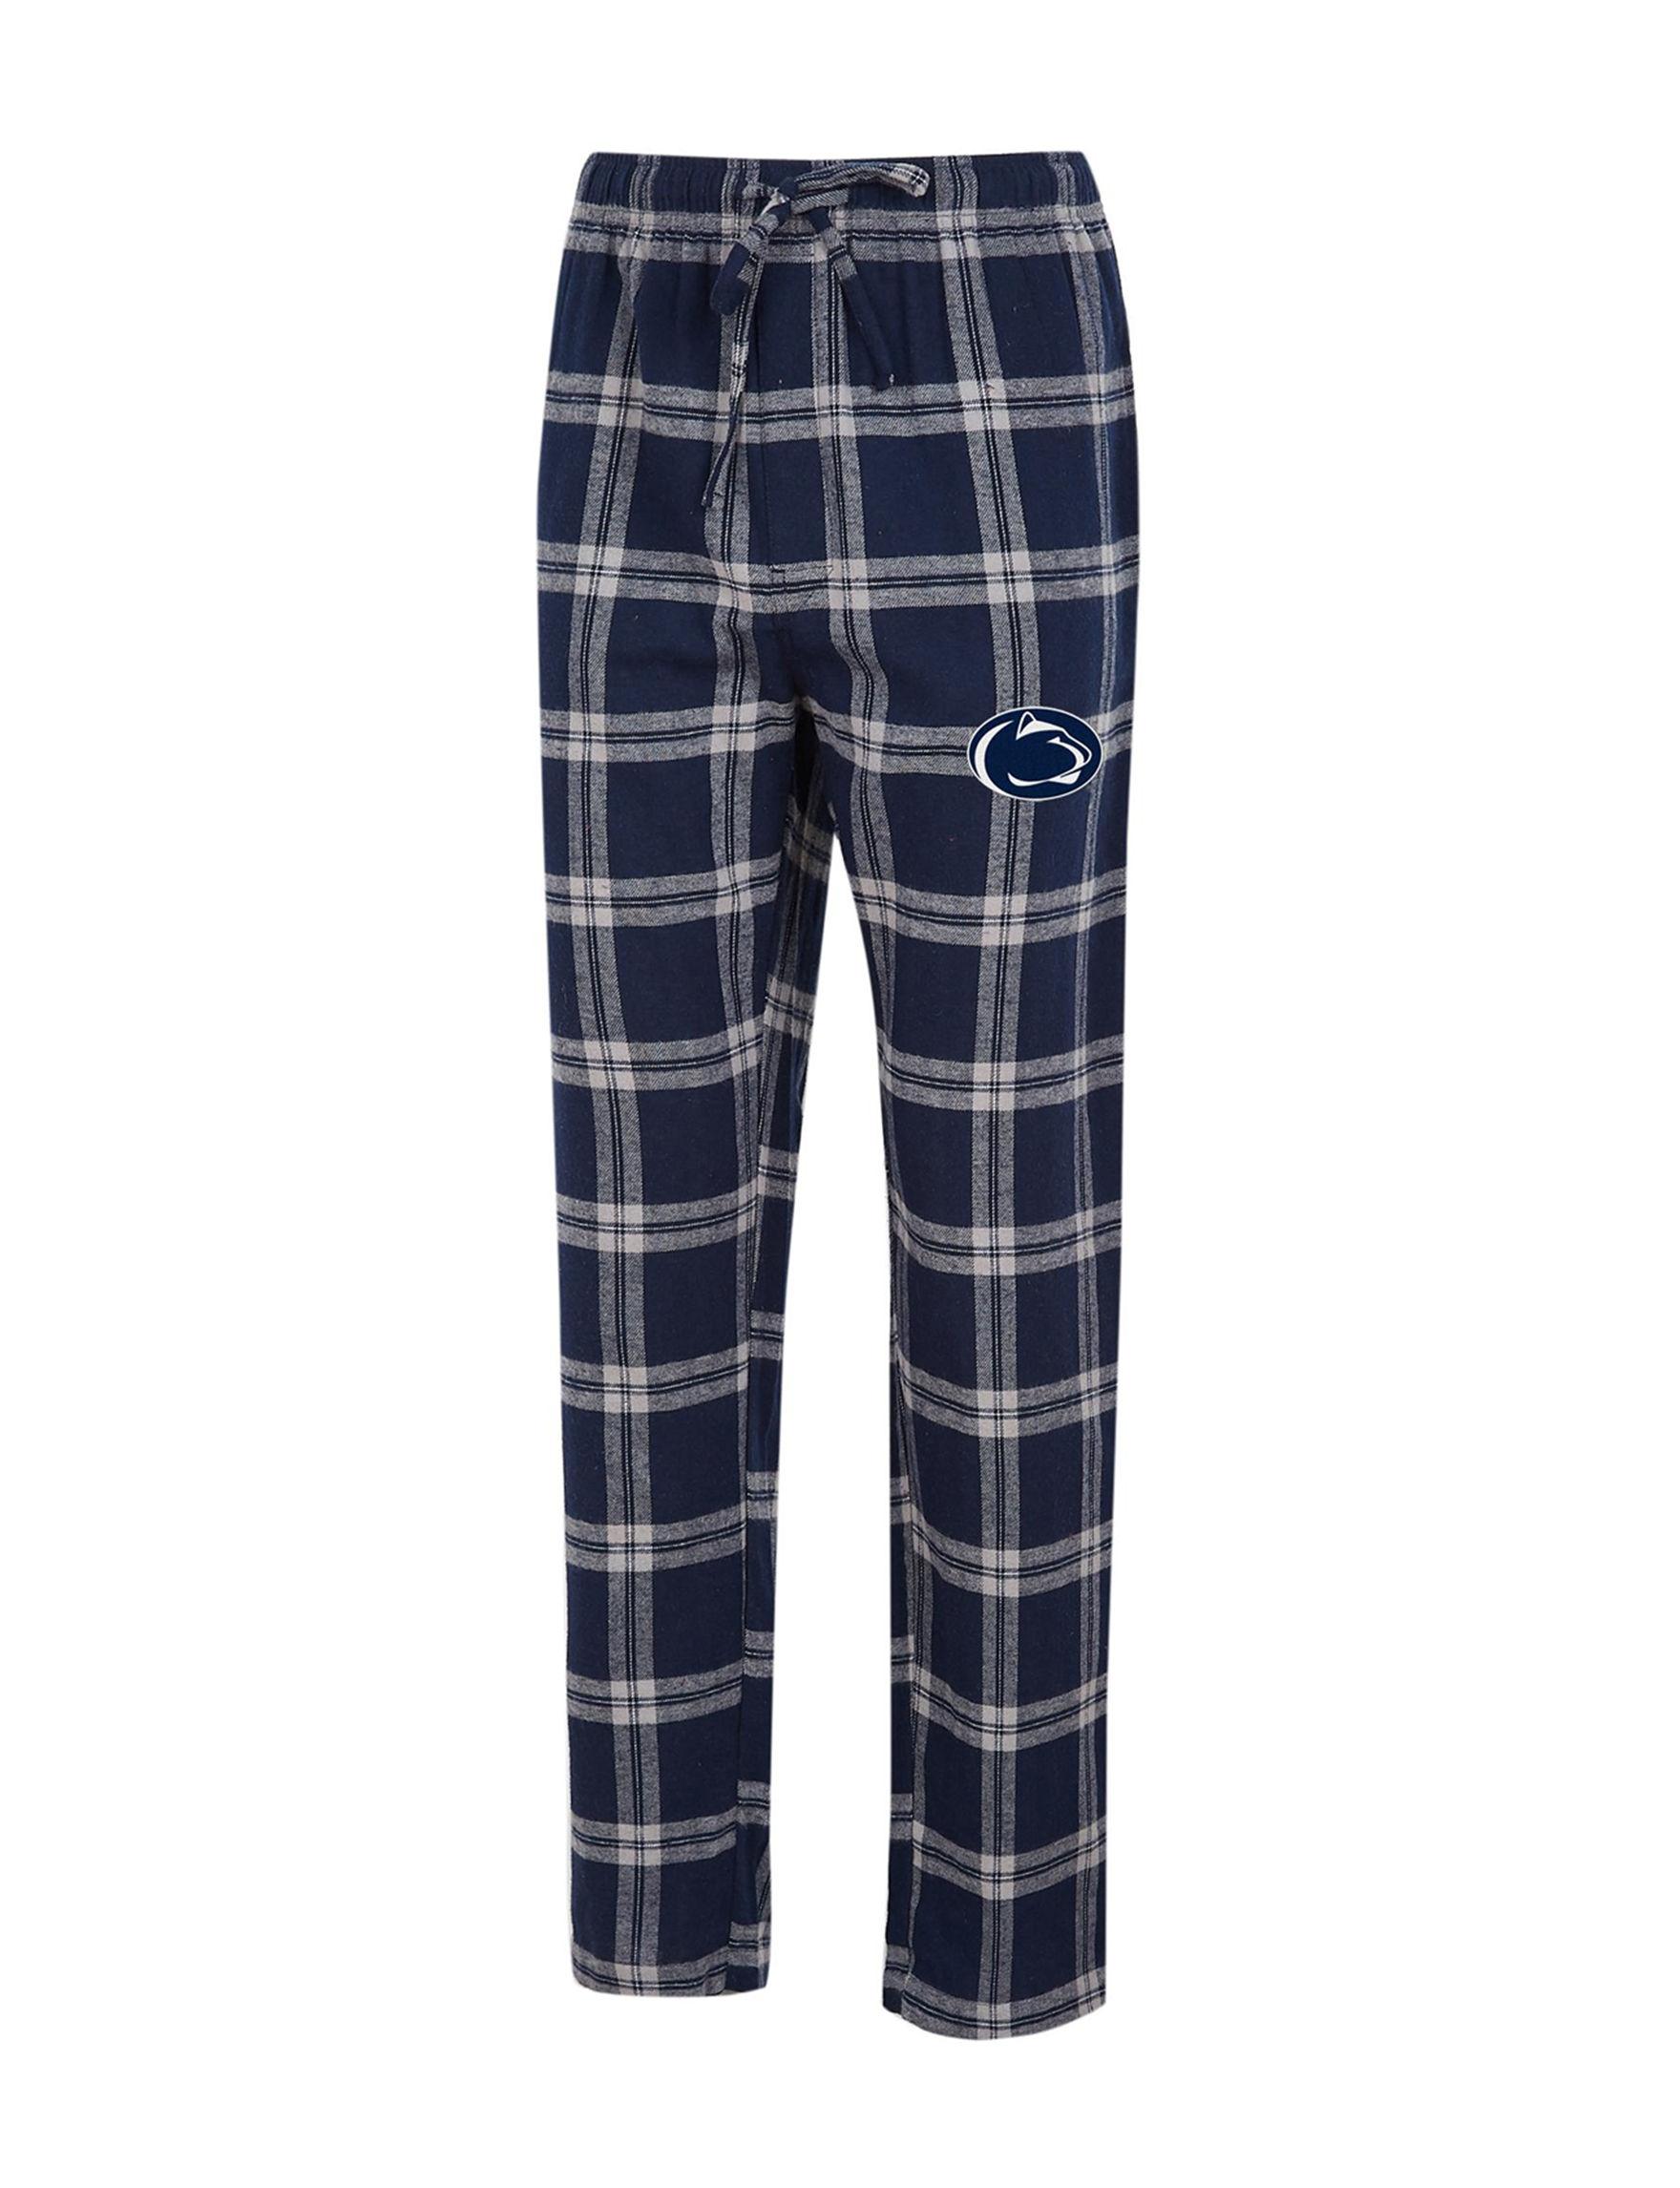 NCAA Navy / Grey Pajama Bottoms